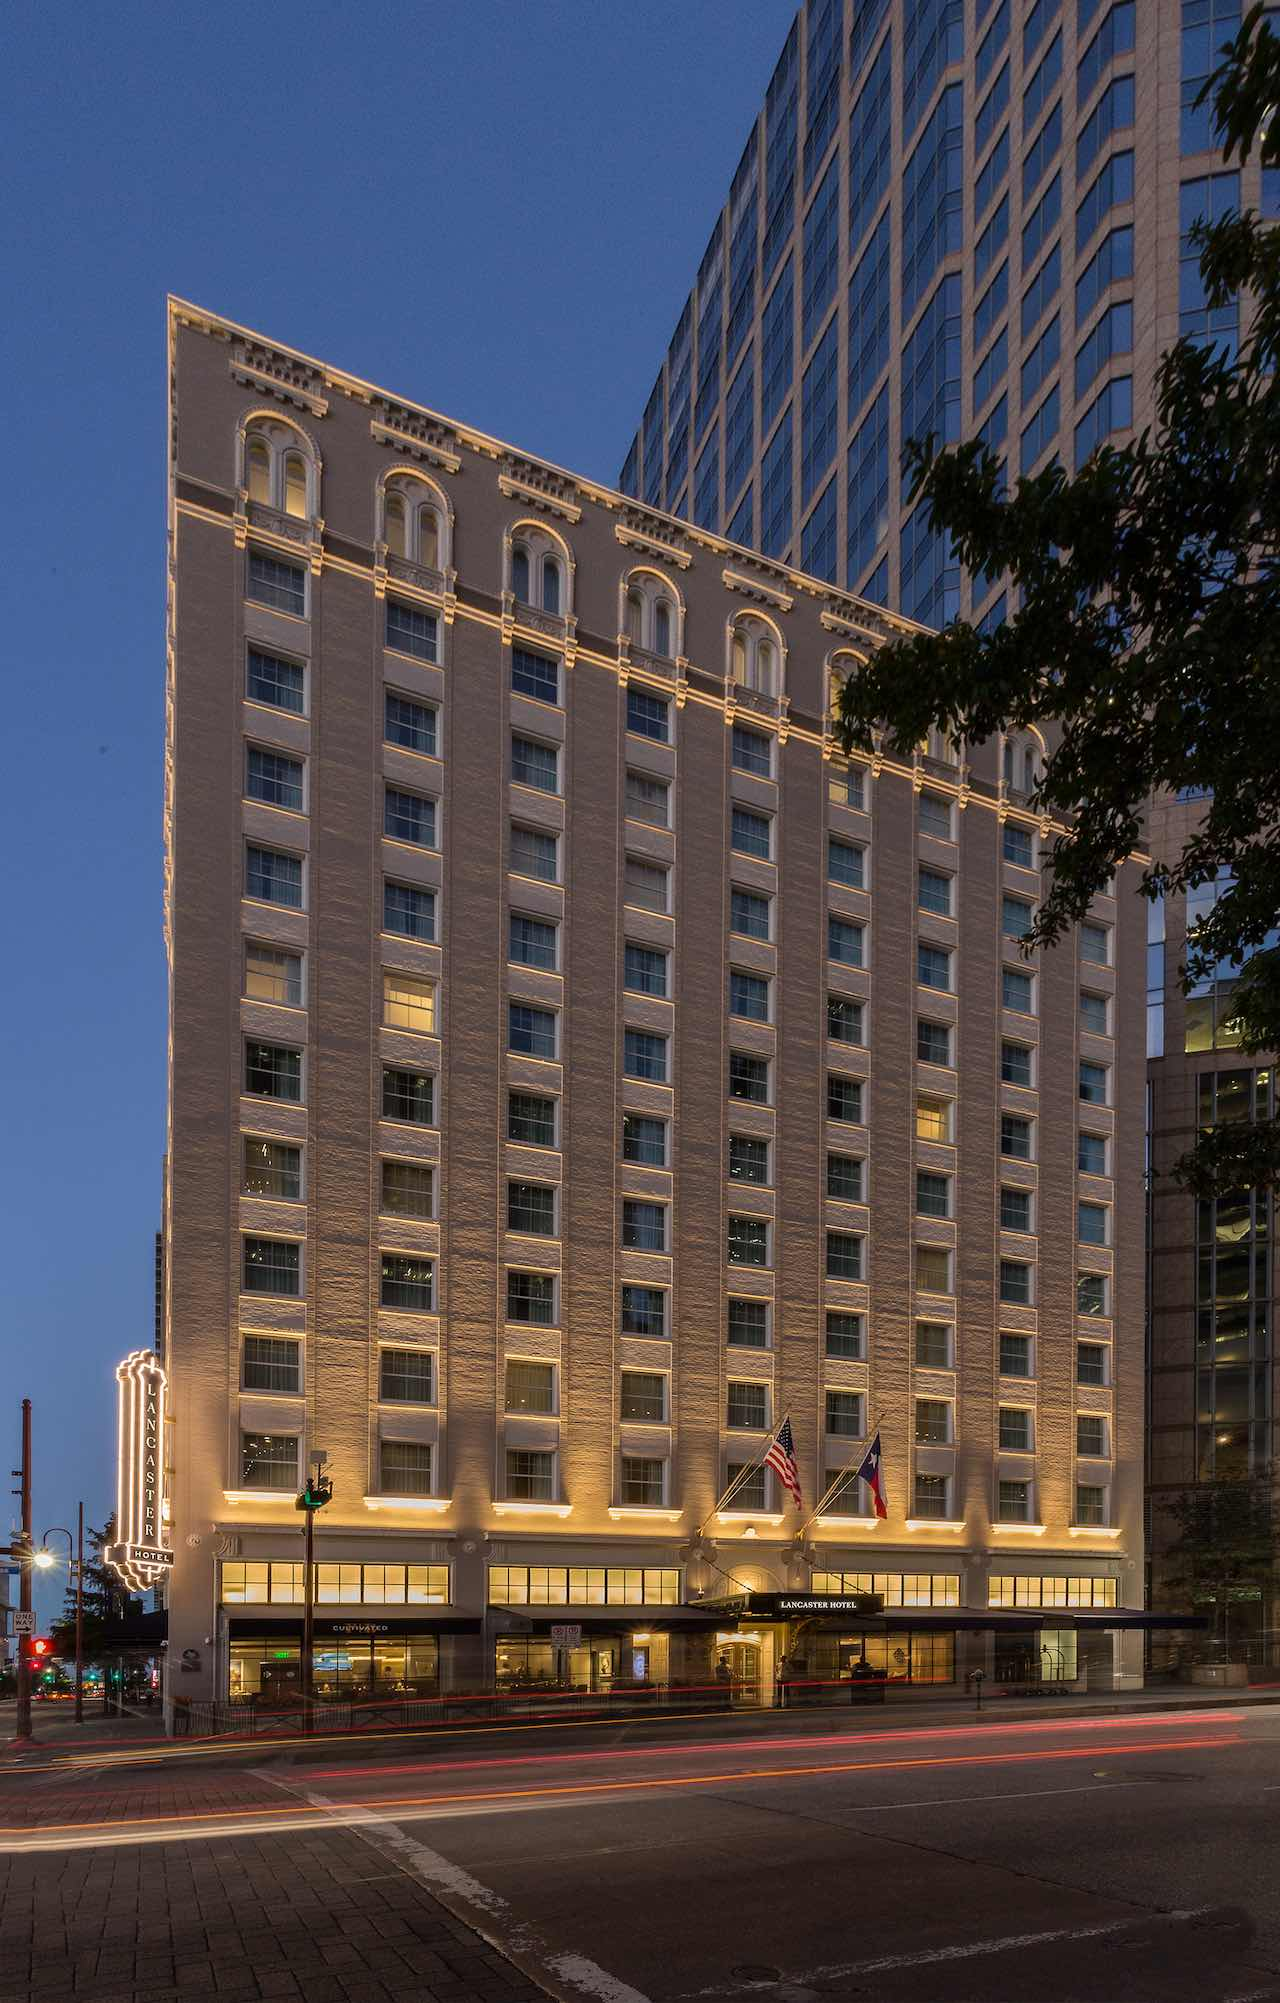 The Lancaster Hotel Houston